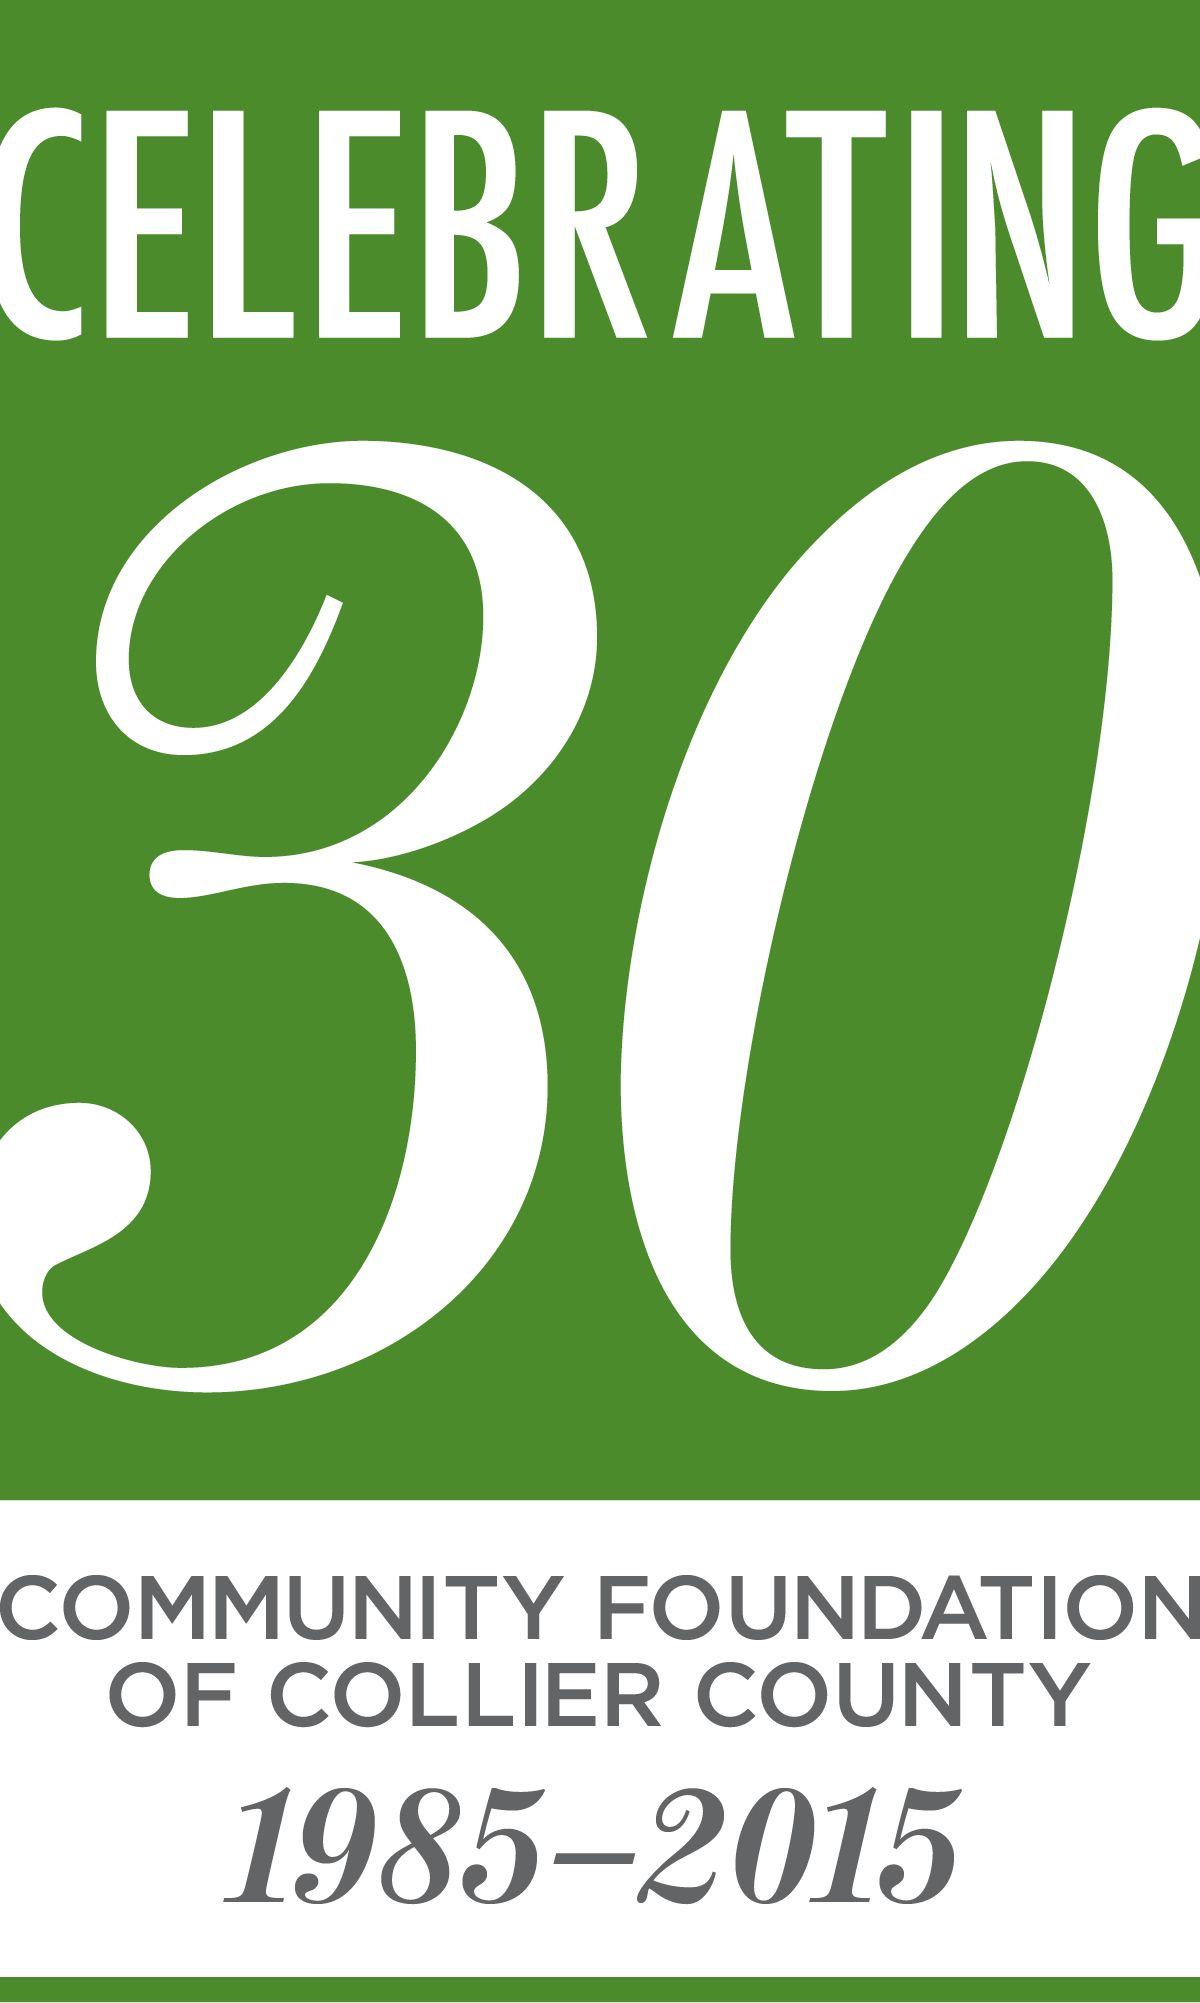 Community Foundation of Collier County amygraudesign